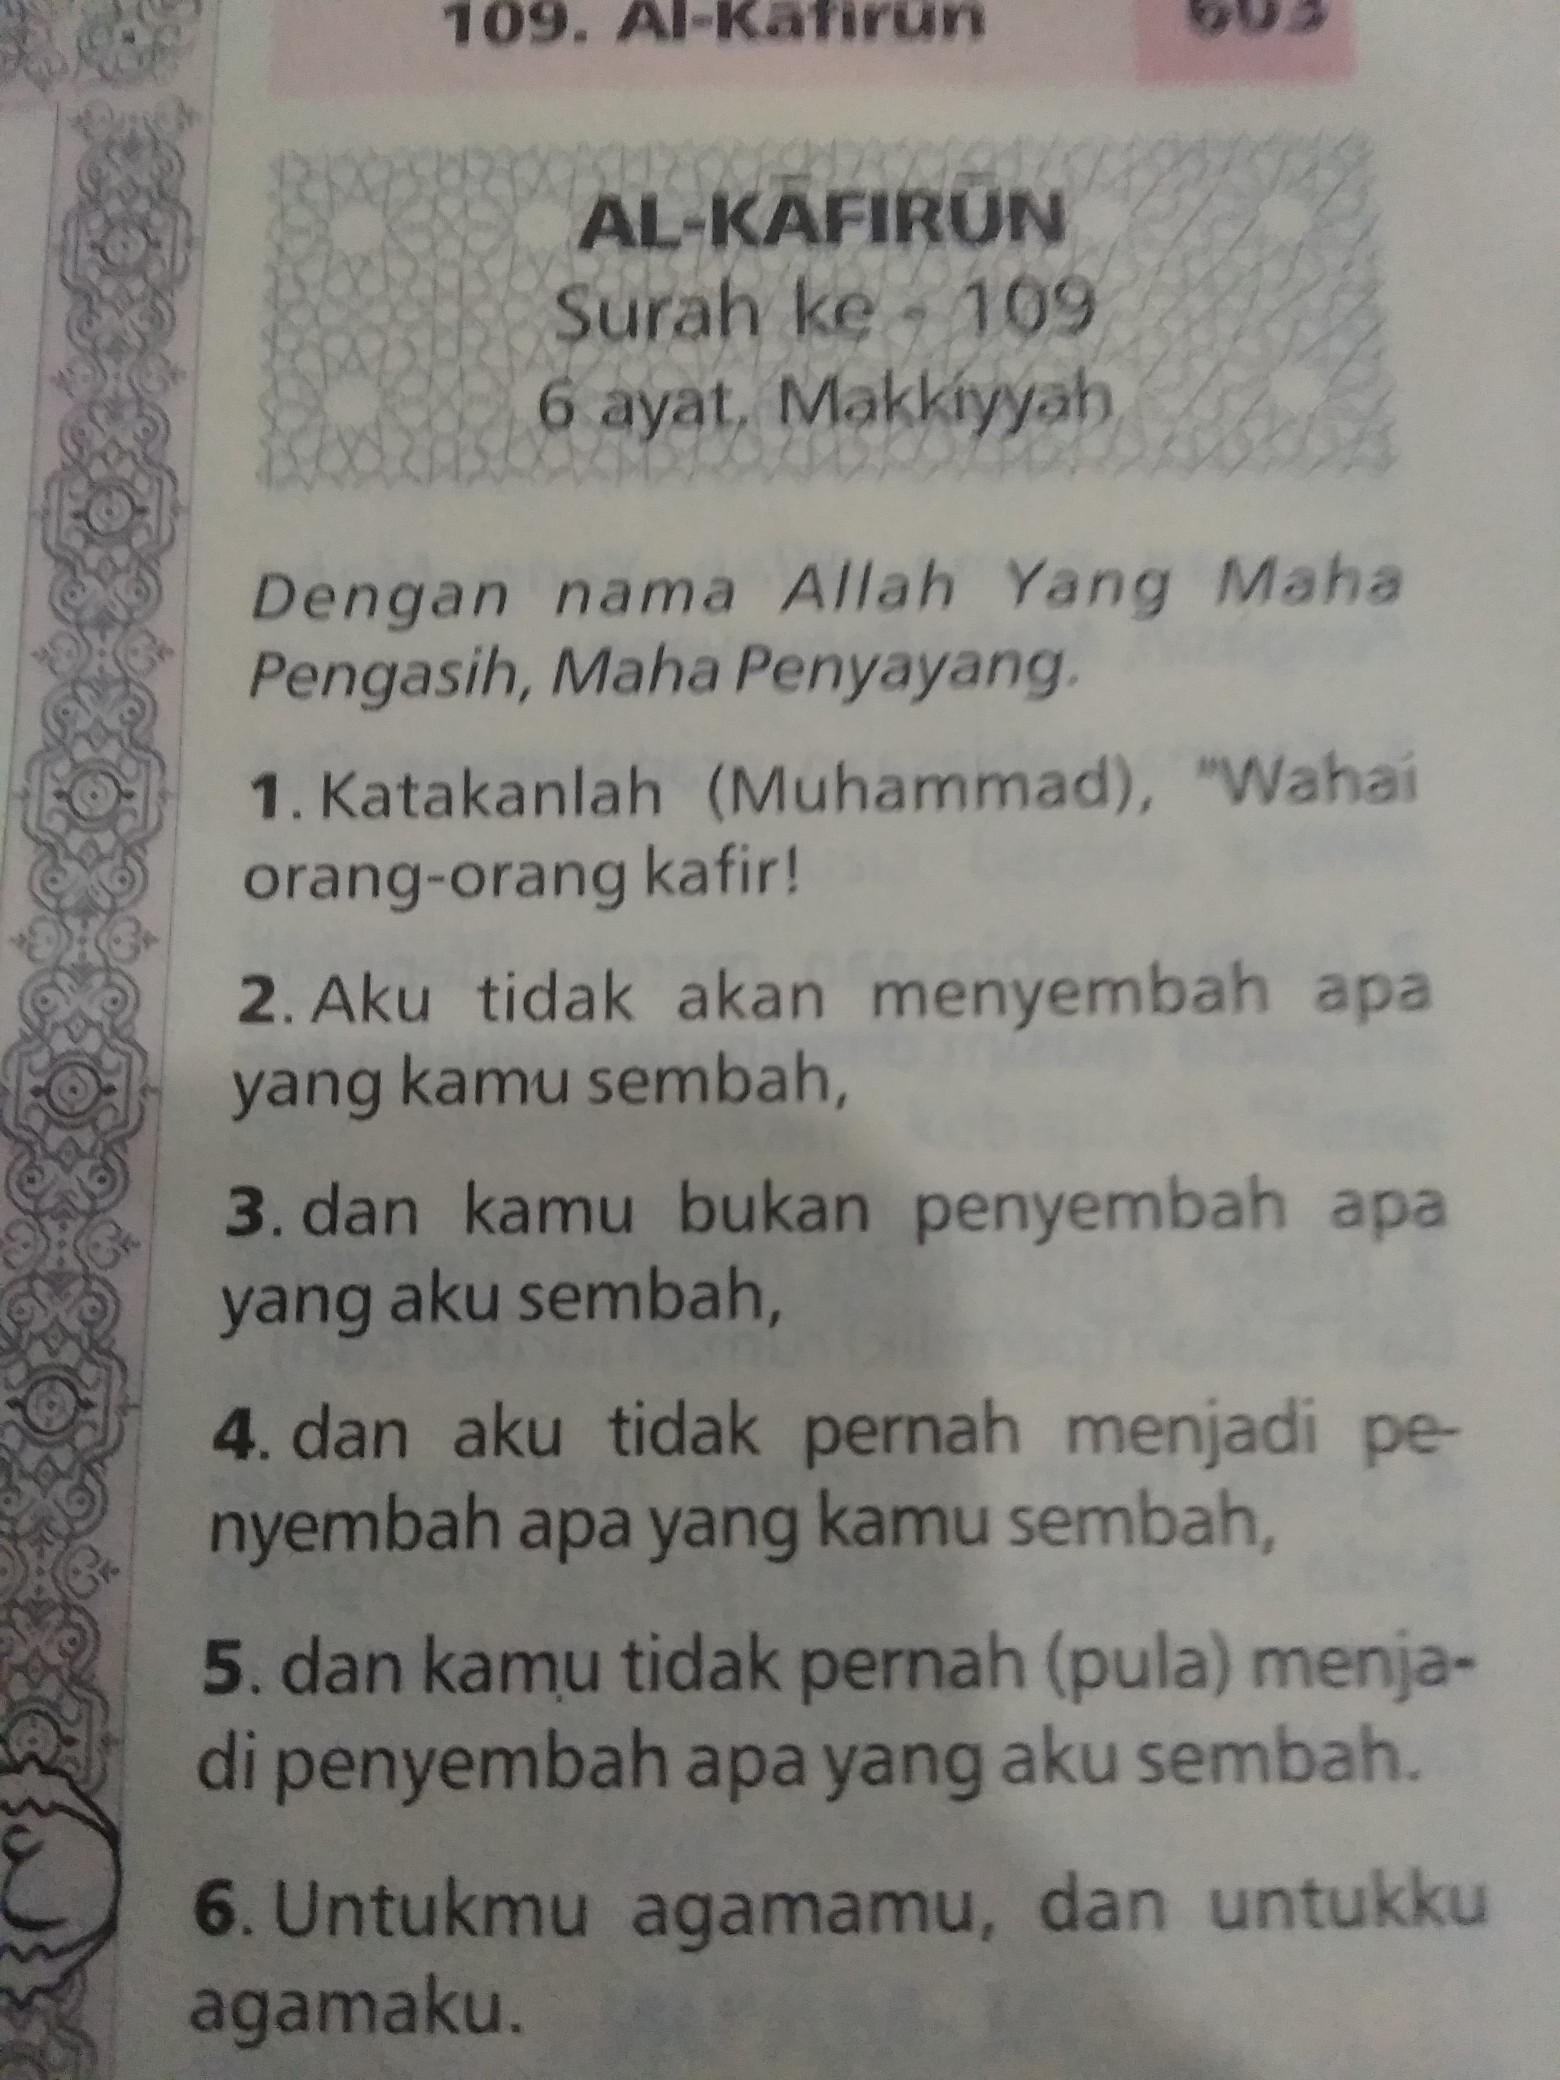 Al-Qur'an Surat Al-Kafirun (Terjemahan...) - SINDOnews Kalam